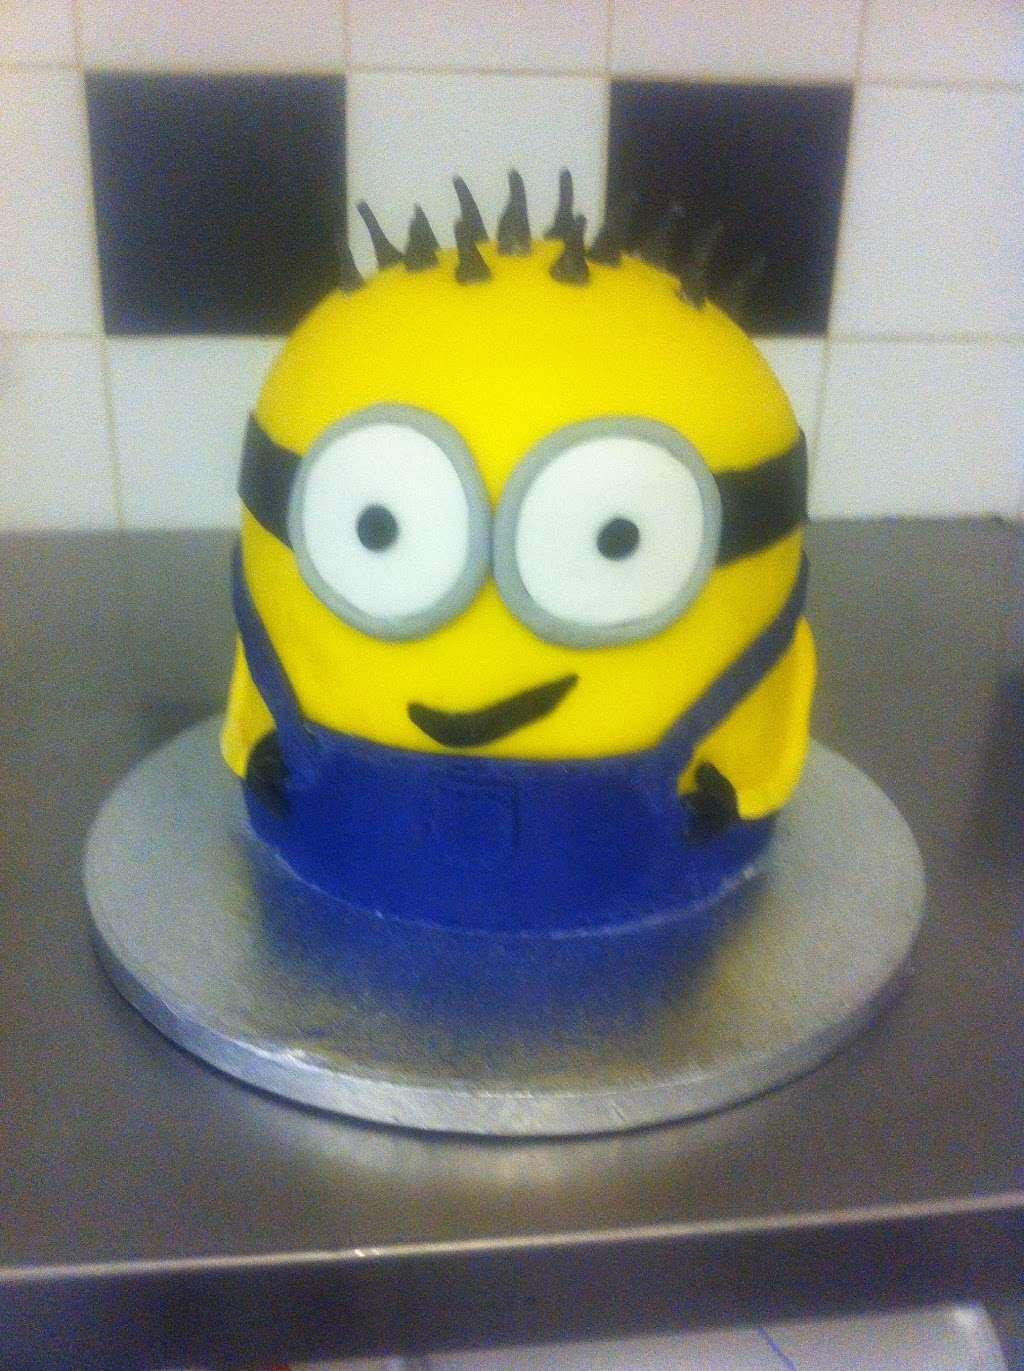 Mrs Cs - bakery  | Photo 10 of 10 | Address: 158 Hollybush Ln, Welwyn Garden City AL7 4JU, UK | Phone: 01707 330097